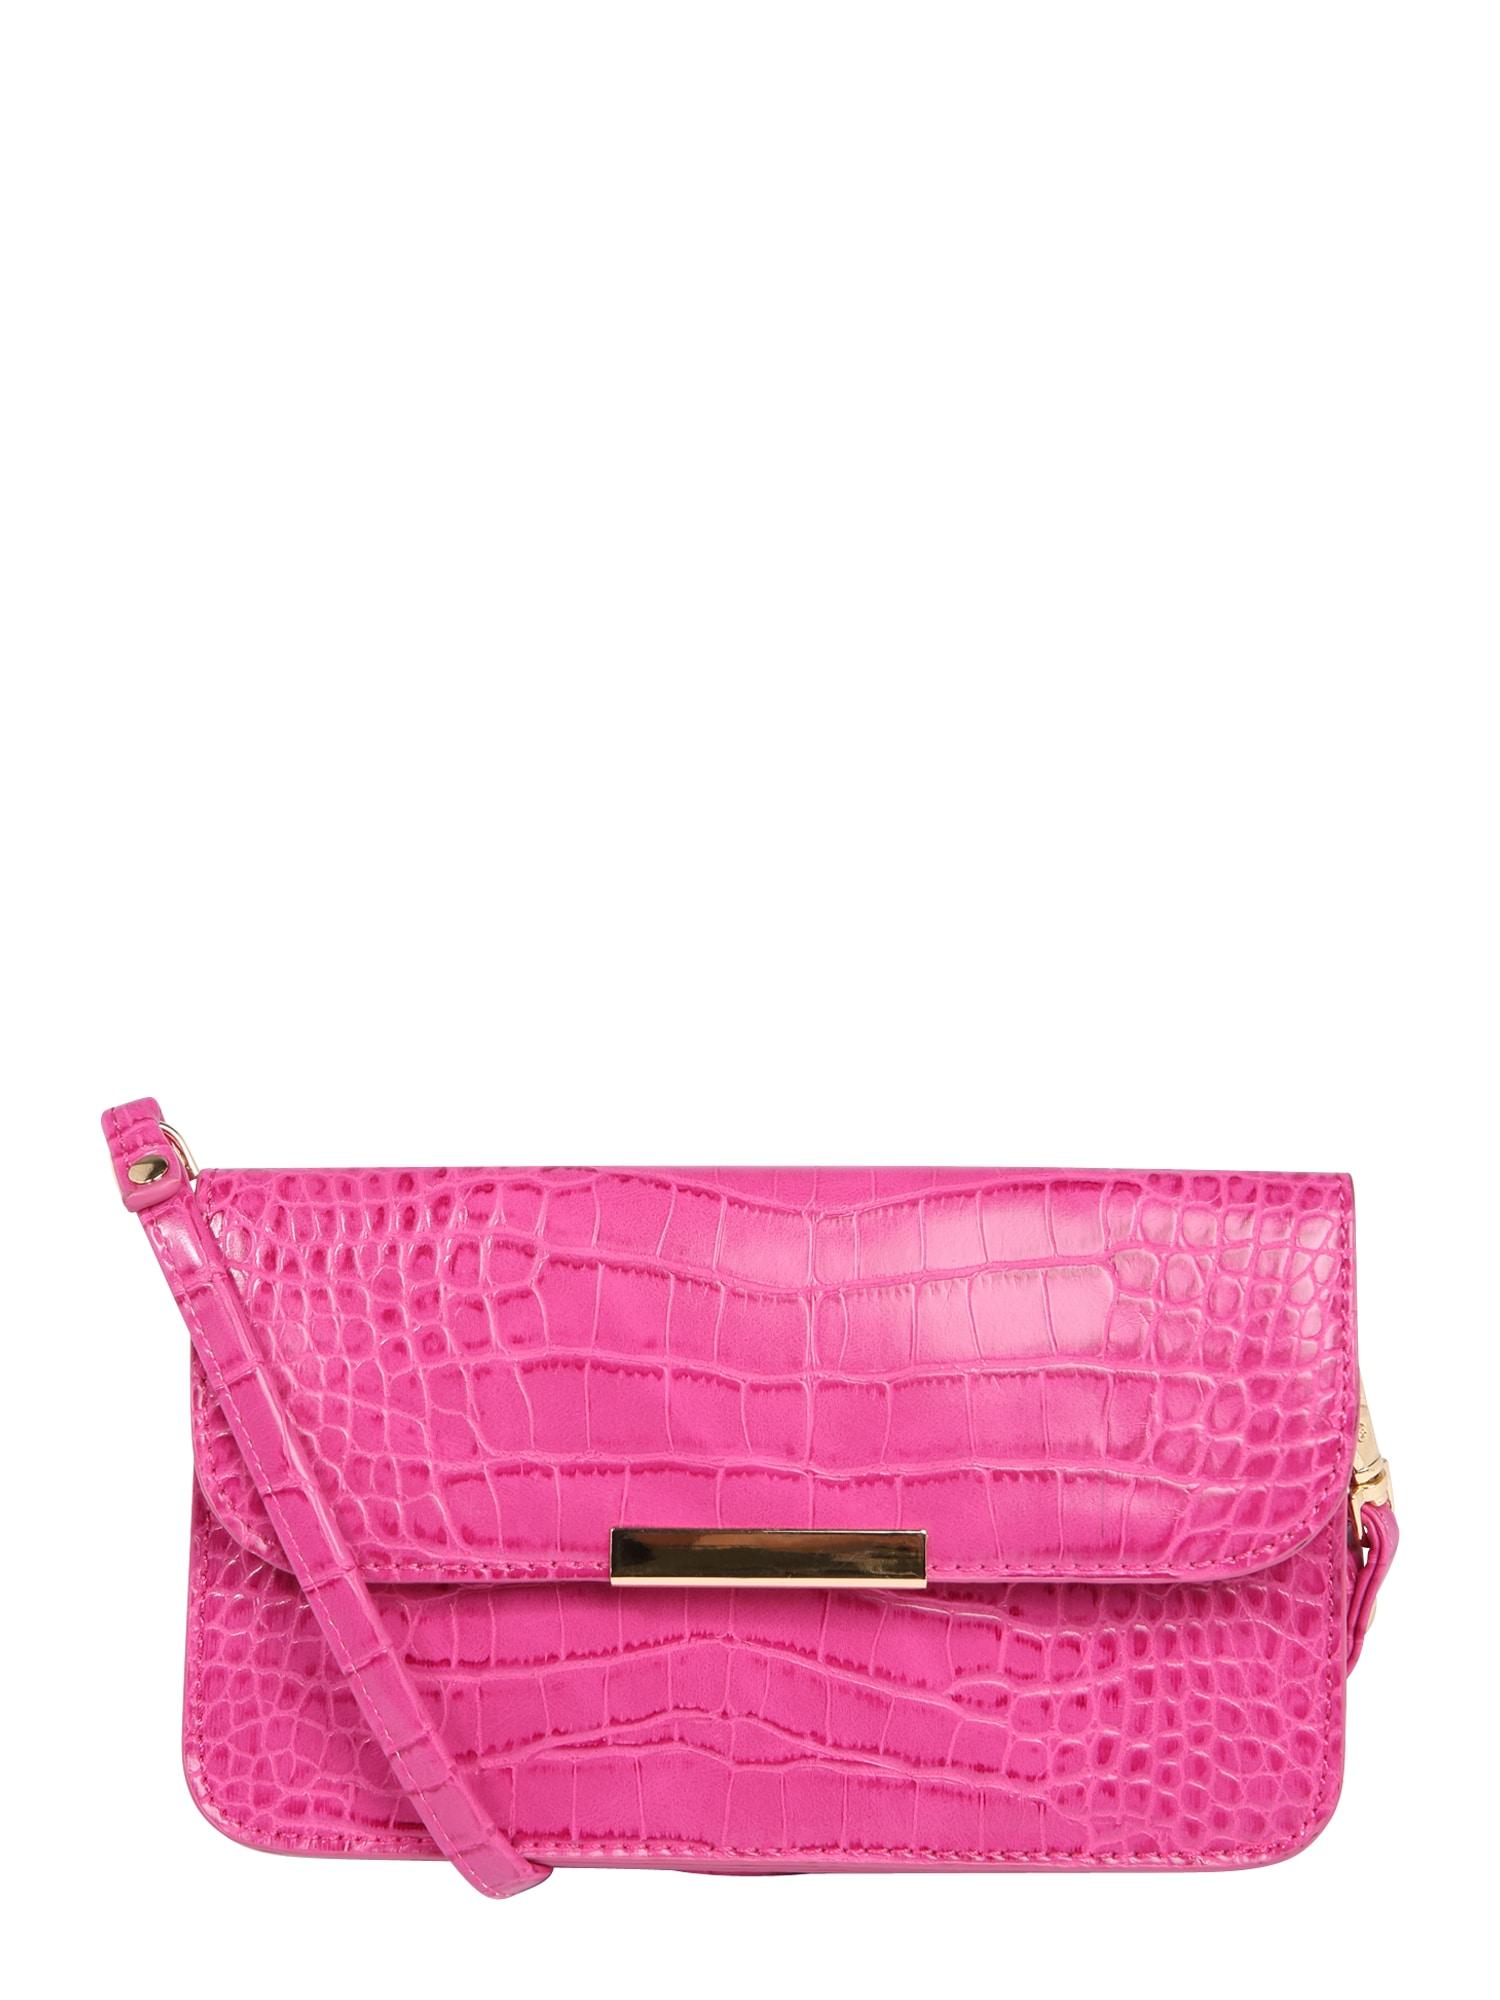 Taška přes rameno Clara pink ABOUT YOU